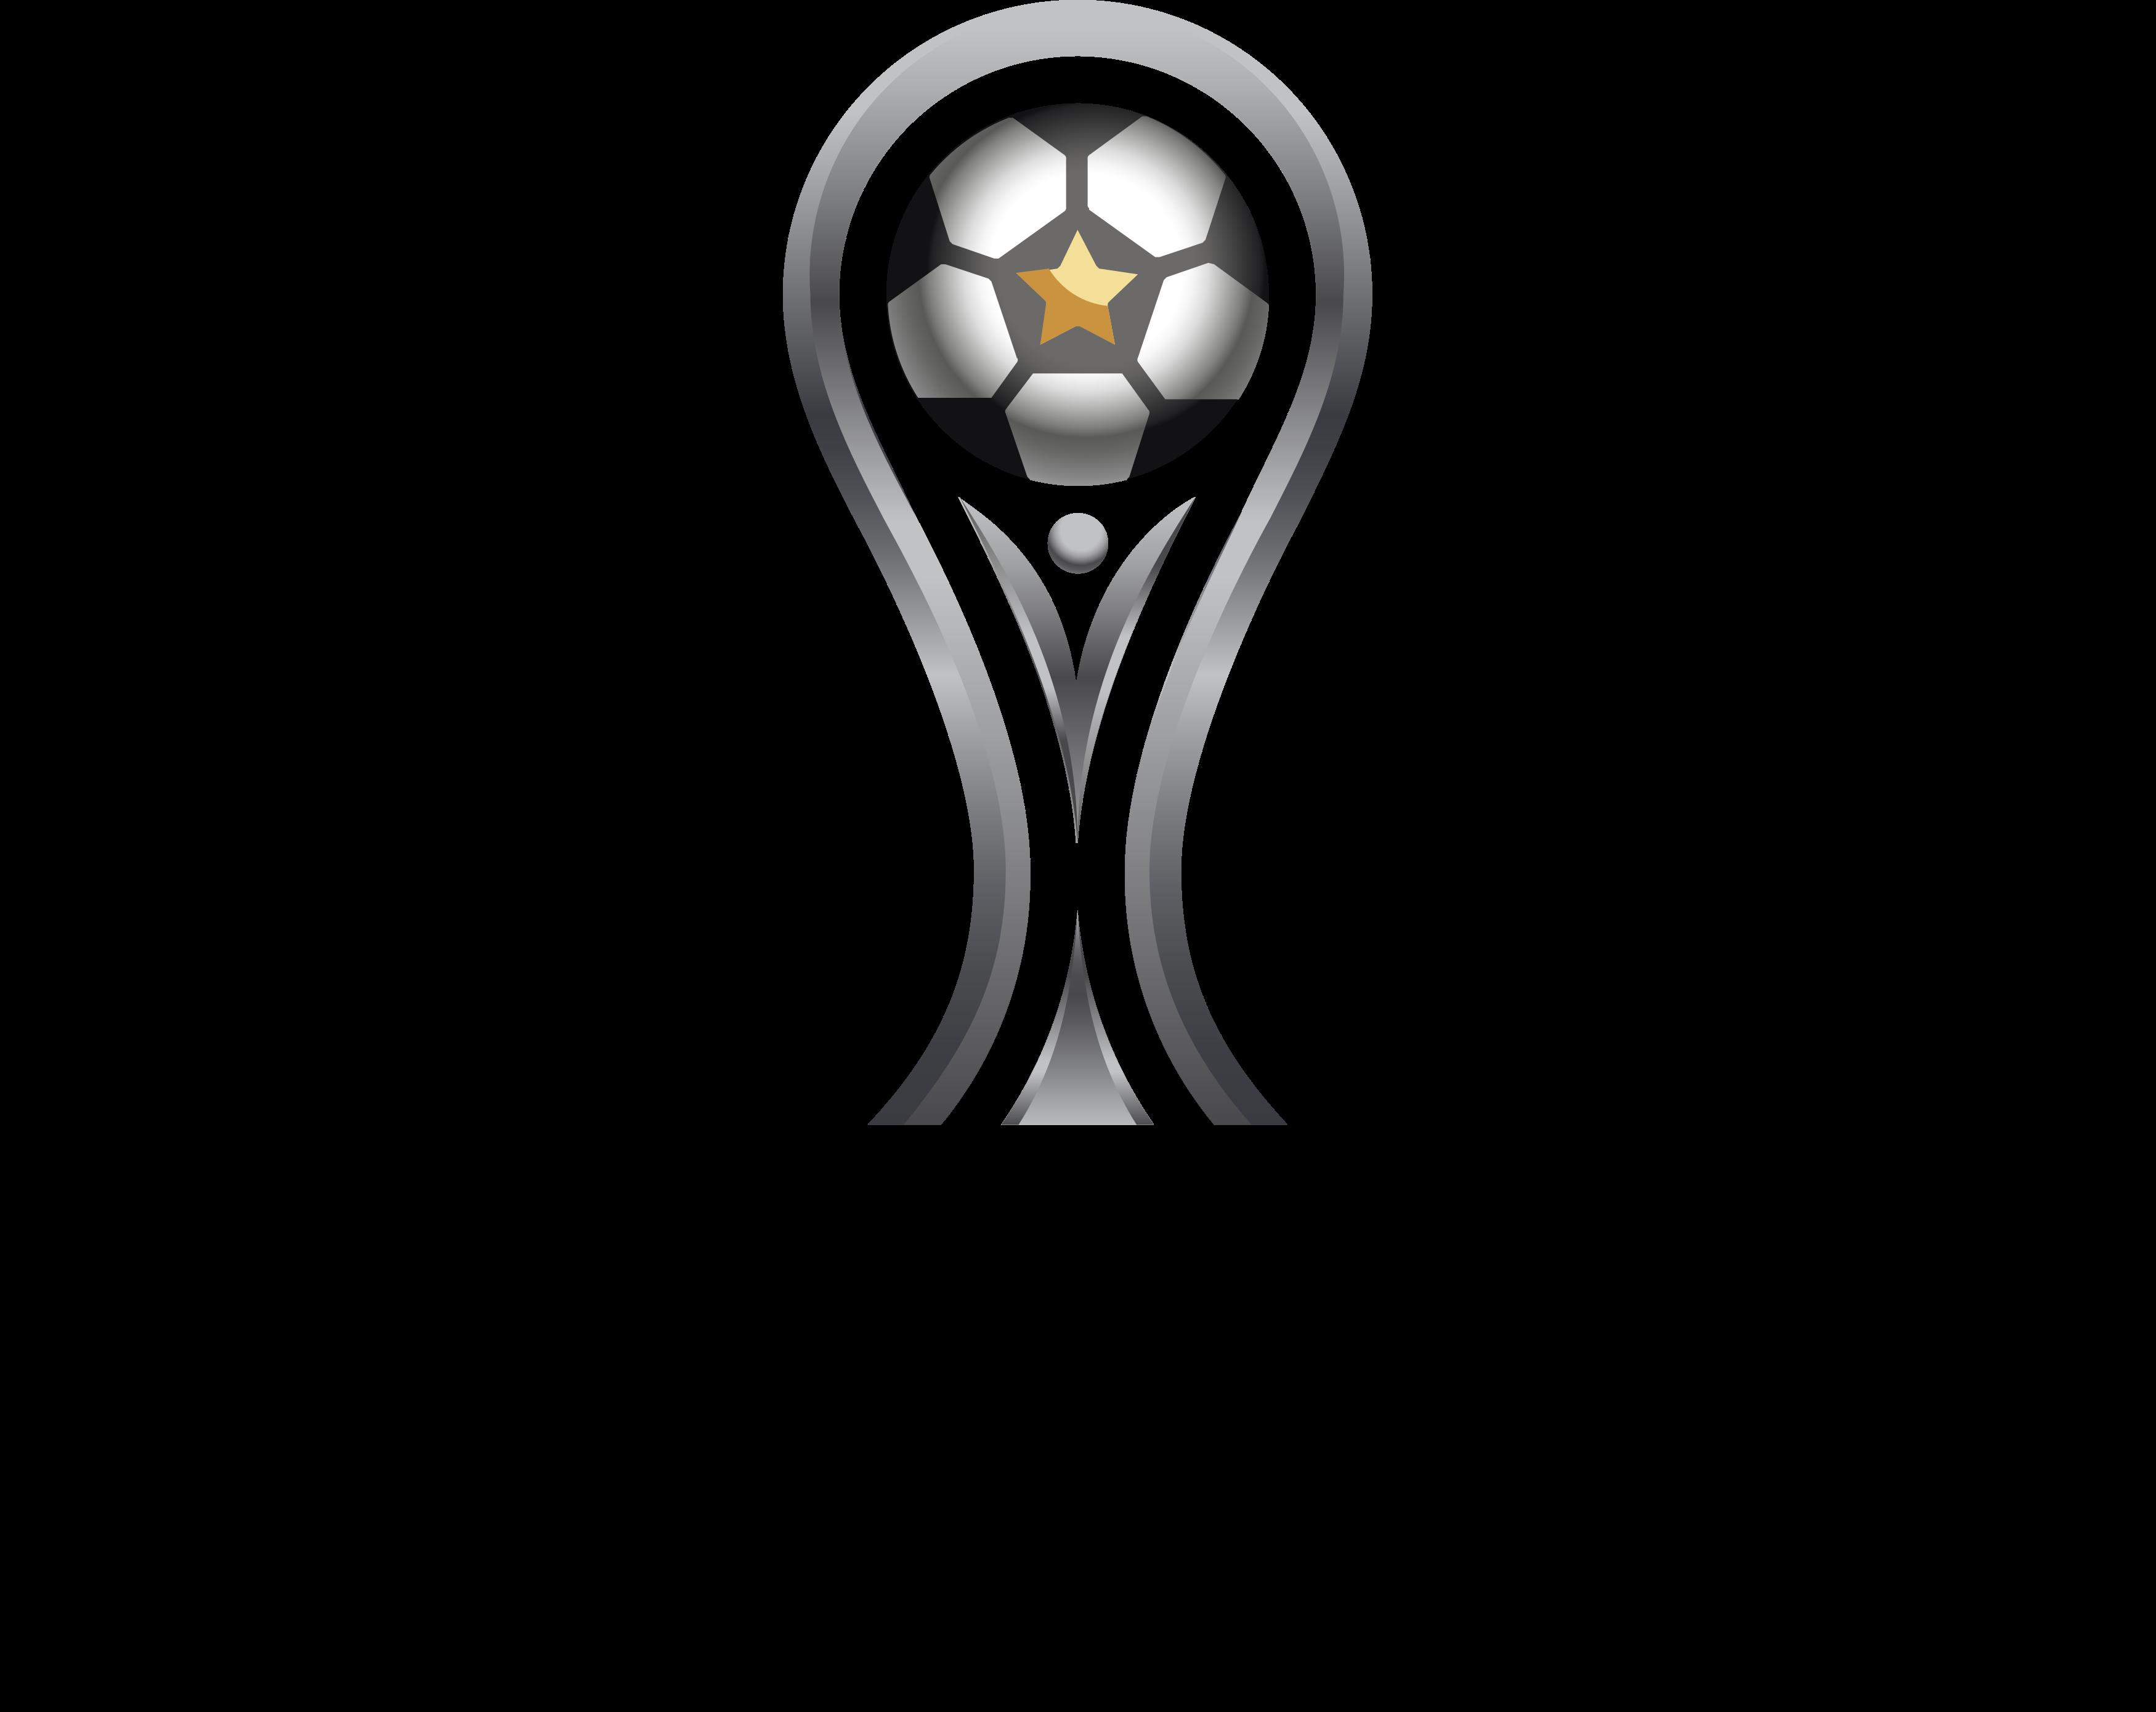 copa-sulamericana-logo